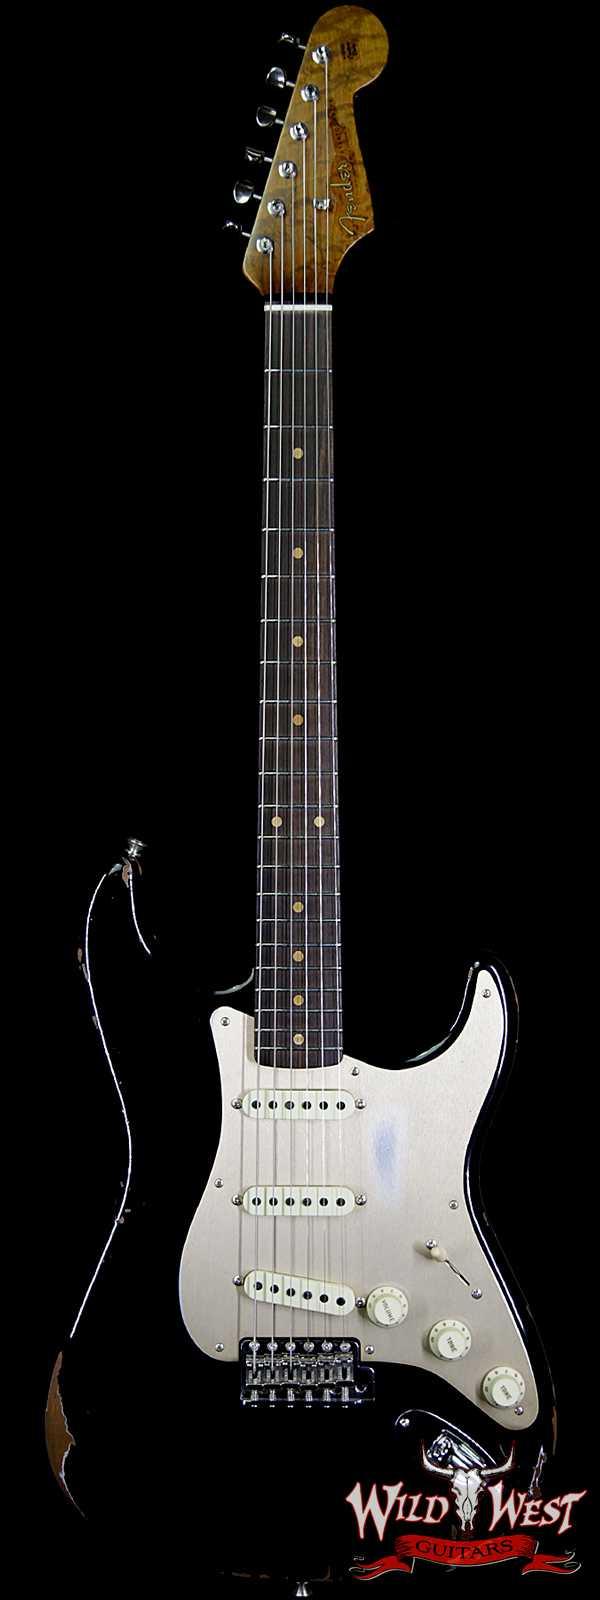 Fender Custom Shop 1960 Roasted Stratocaster Relic Birdseye Maple Neck Aged Black